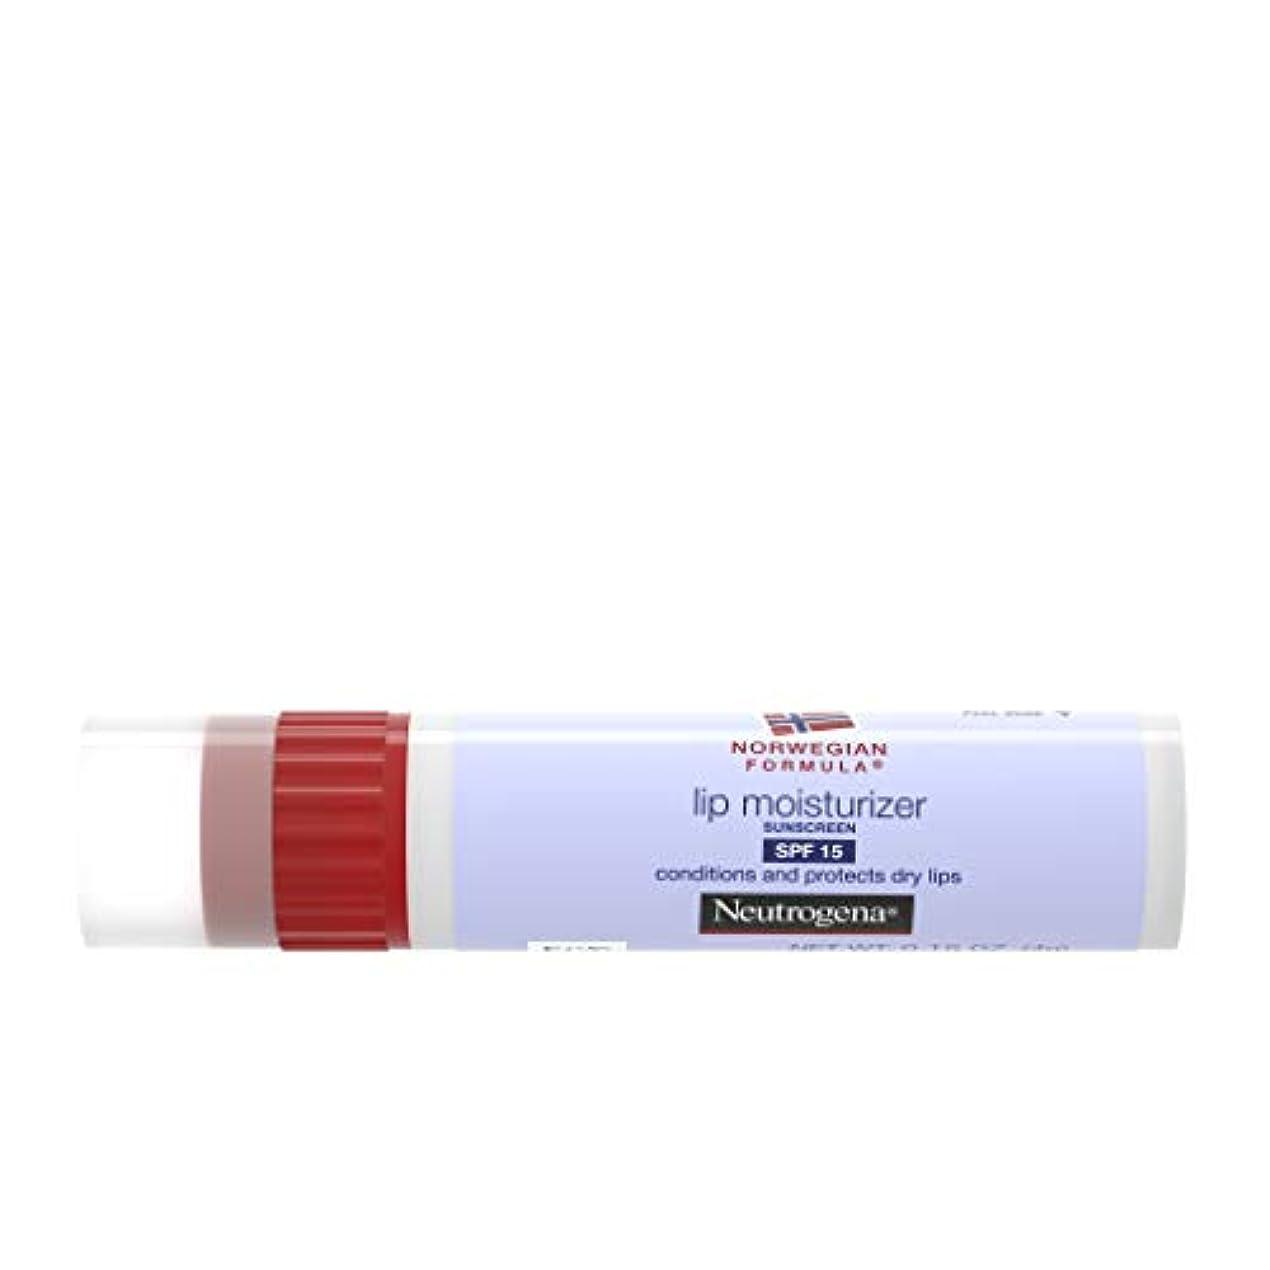 十臨検終点Neutrogena Norwegian Formula Lip Moisturizer, SPF 15, 0.15 Ounce (並行輸入品)